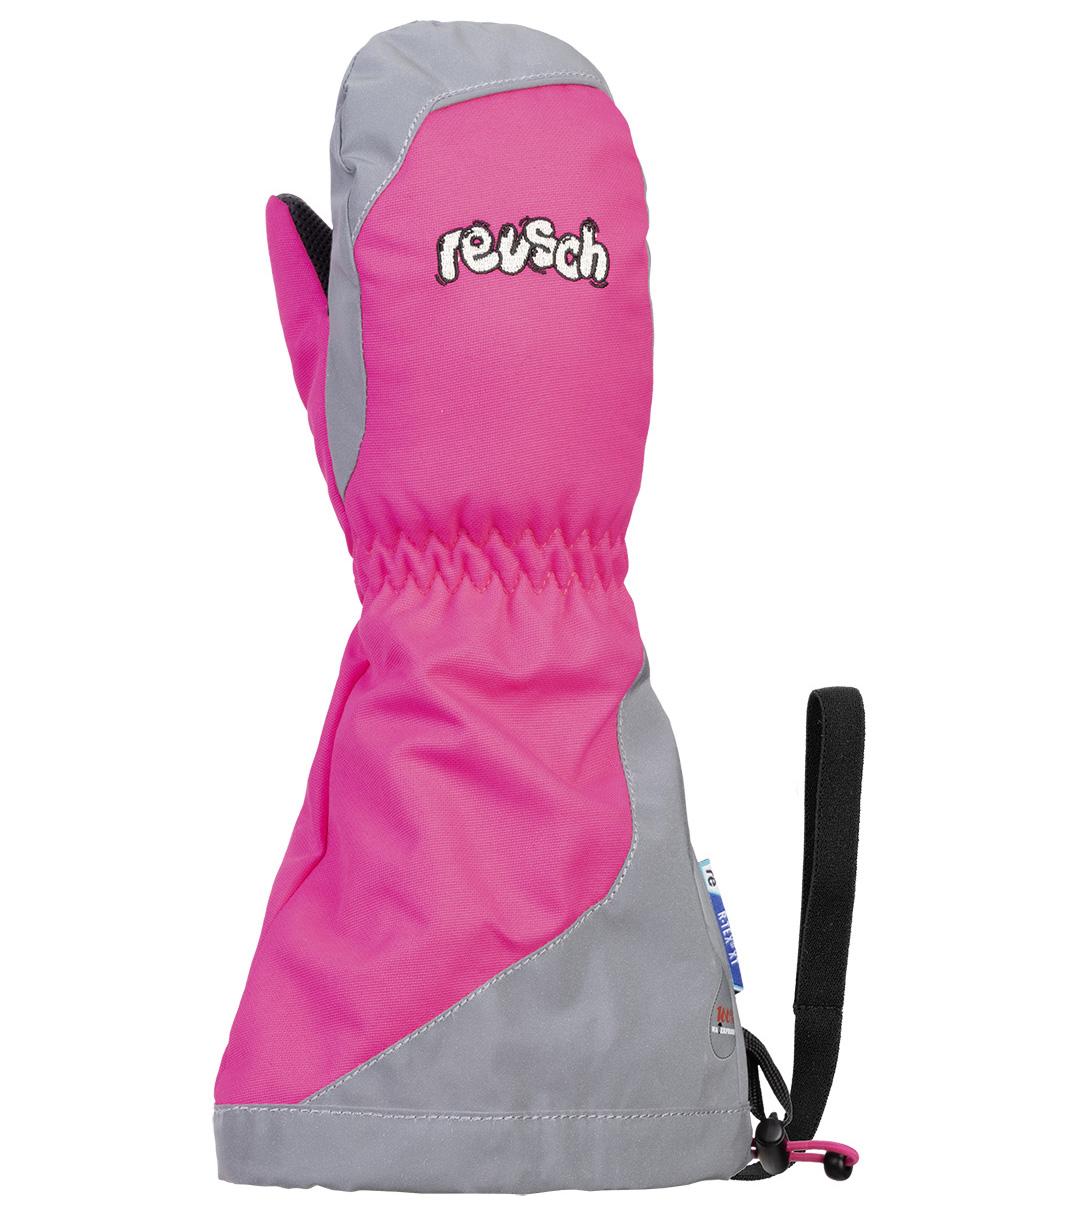 Варежки Reusch 2020-21 Walter R-Tex® Xt Mitten Pink Glo/Reflective (Inch (Дюйм):Iii)